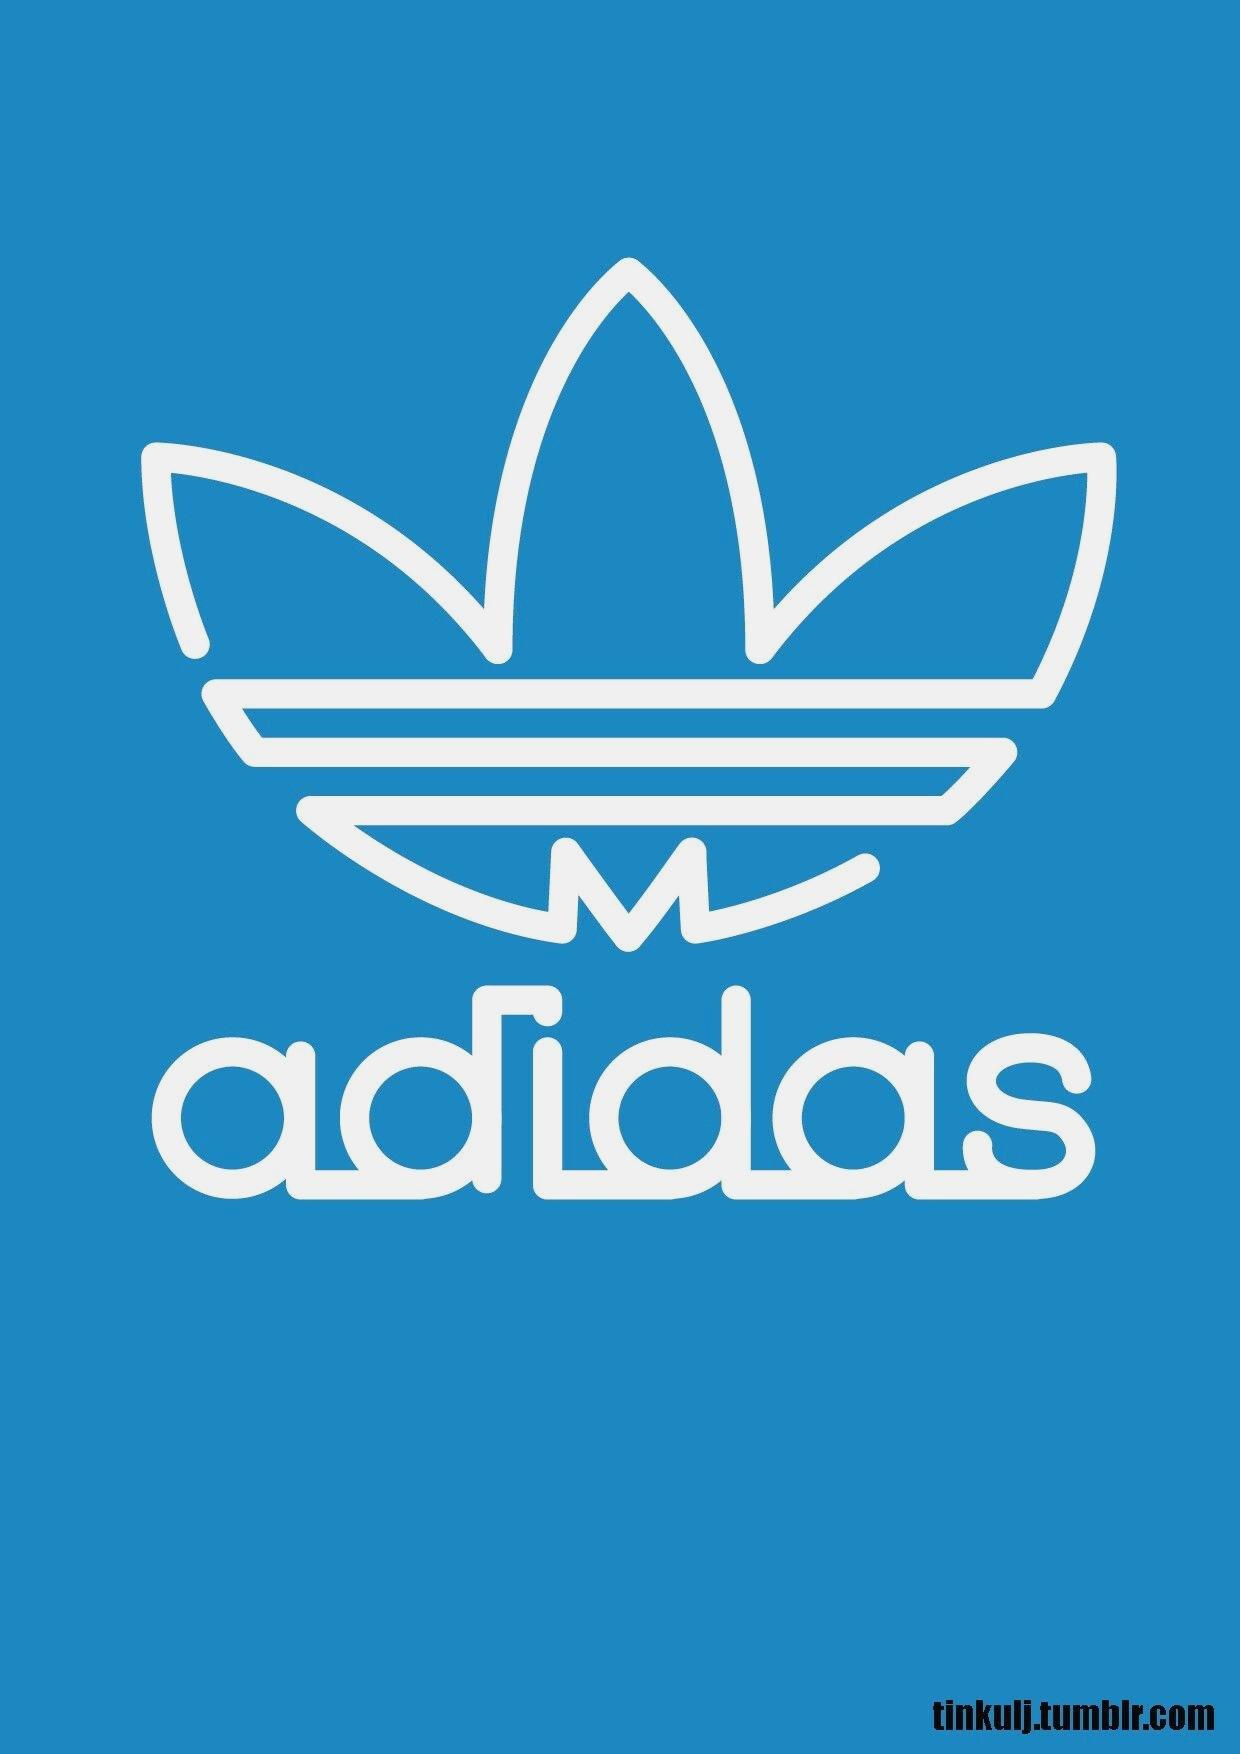 Hintergrundbilder Hd Hintergrundbild Iphone Nike Tapete - Originals Adidas , HD Wallpaper & Backgrounds